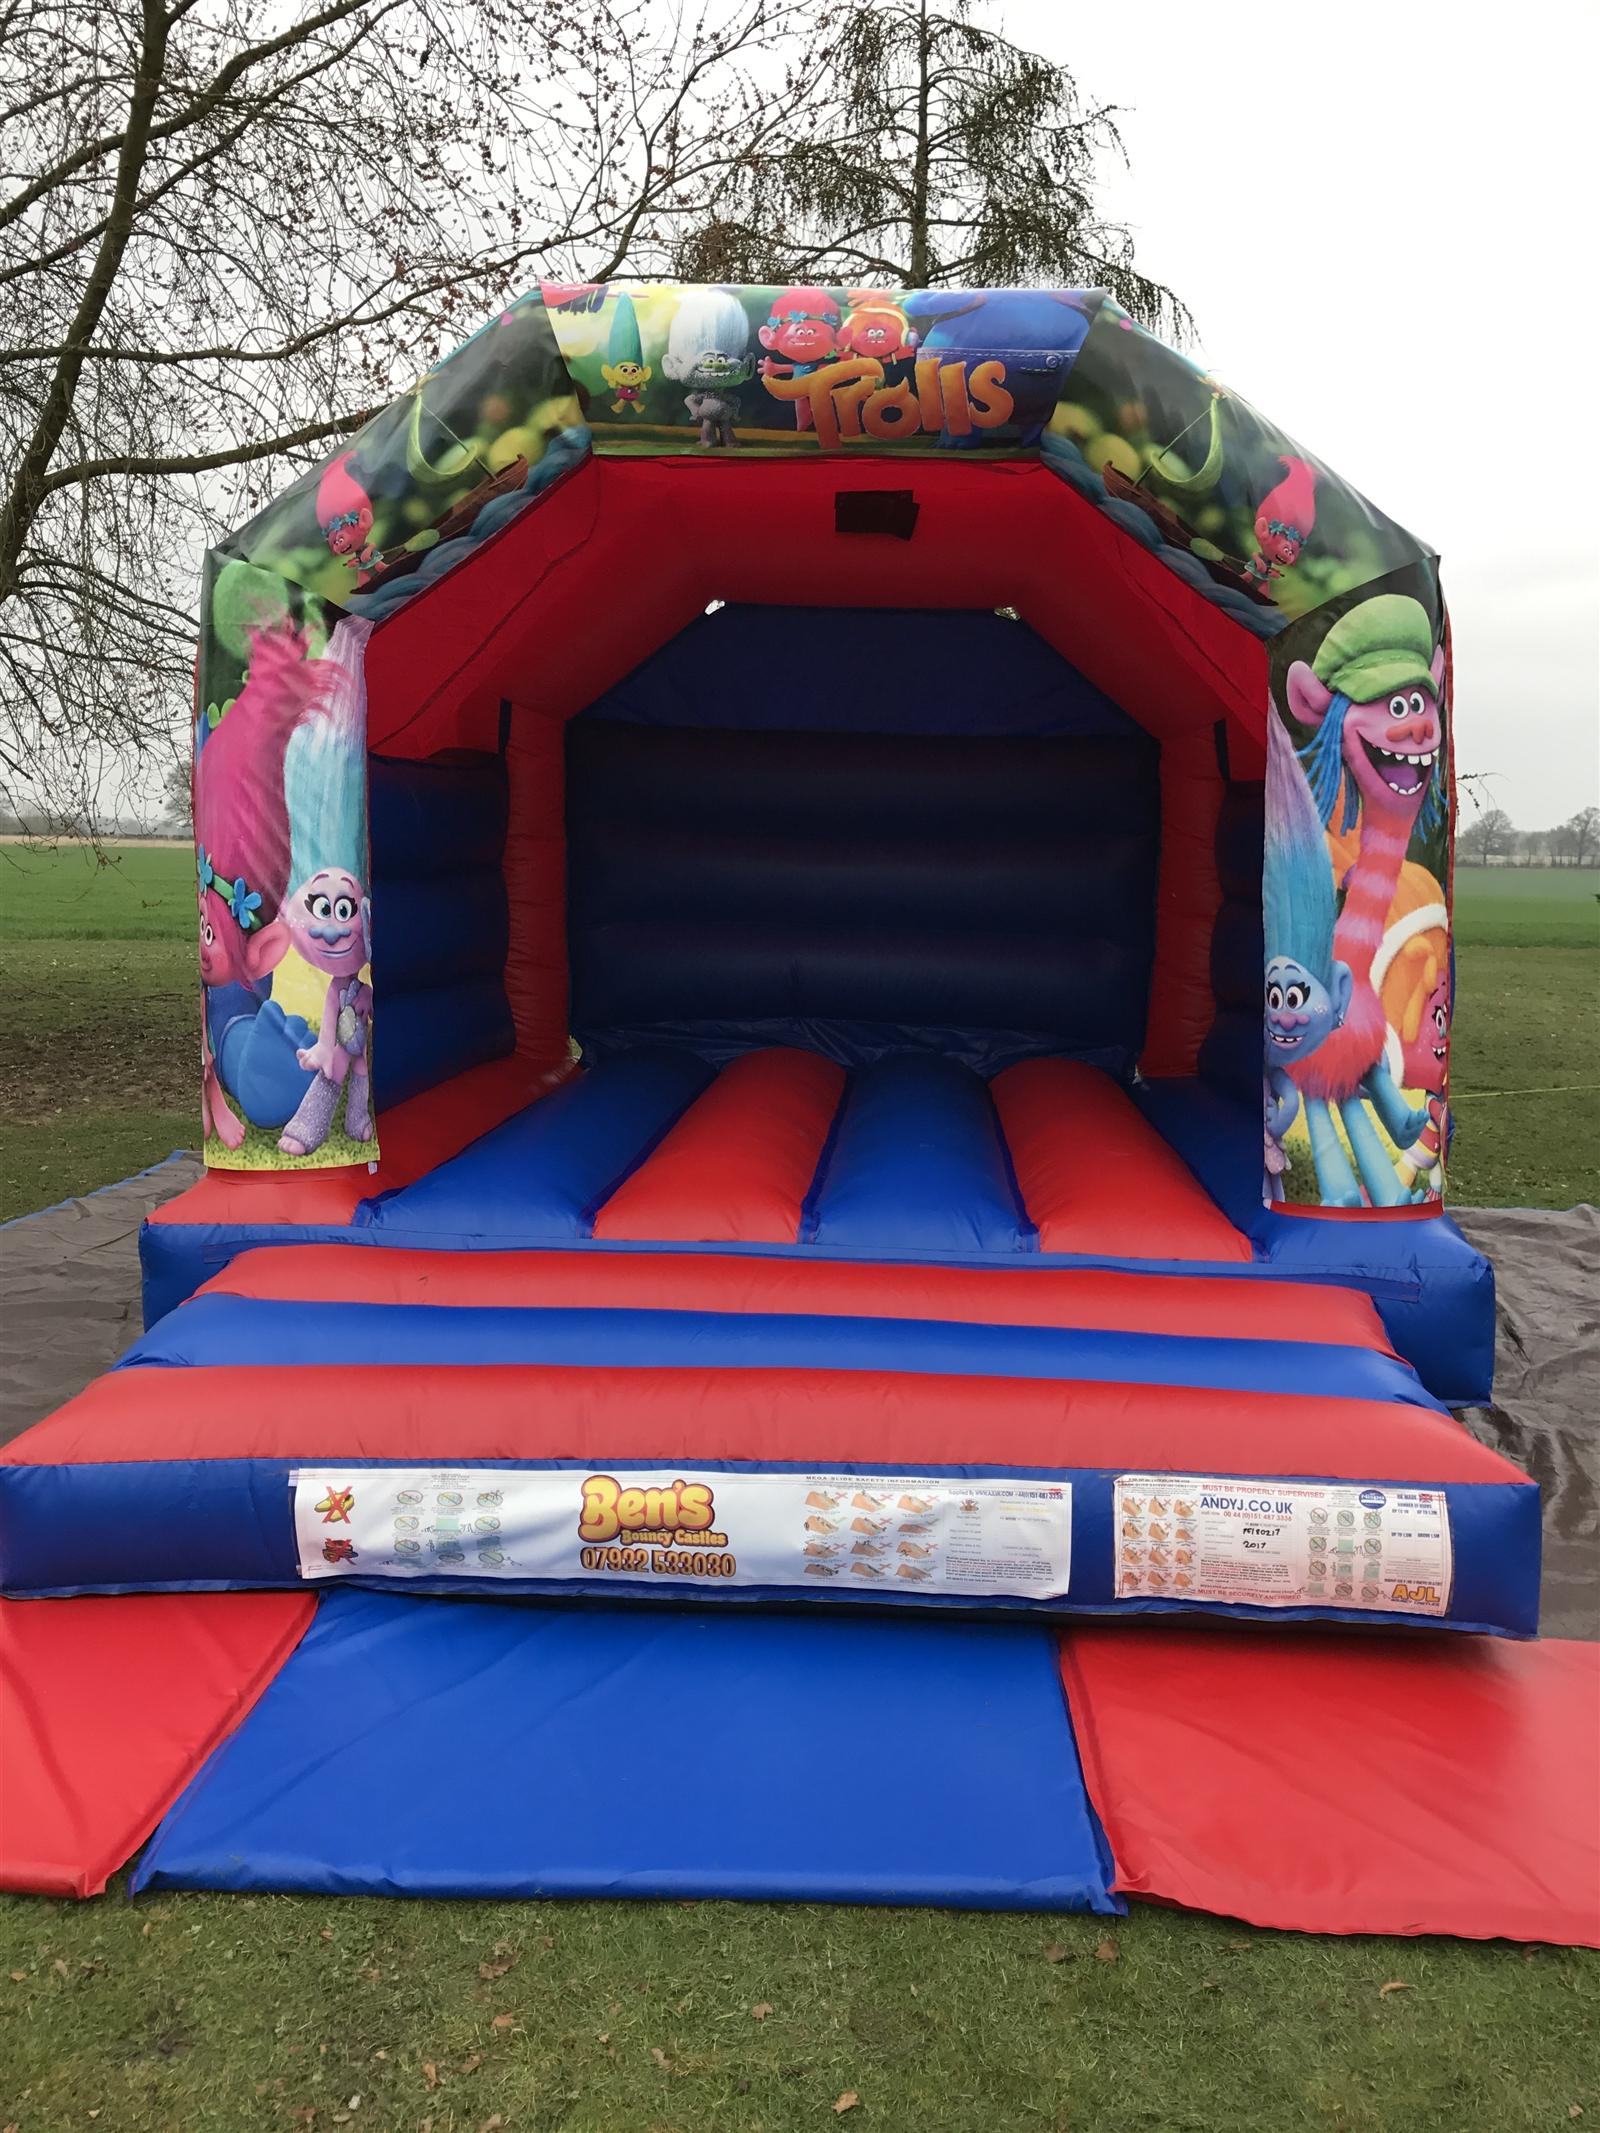 chair cover hire hemel hempstead collapsible garden chairs bouncy castle castles